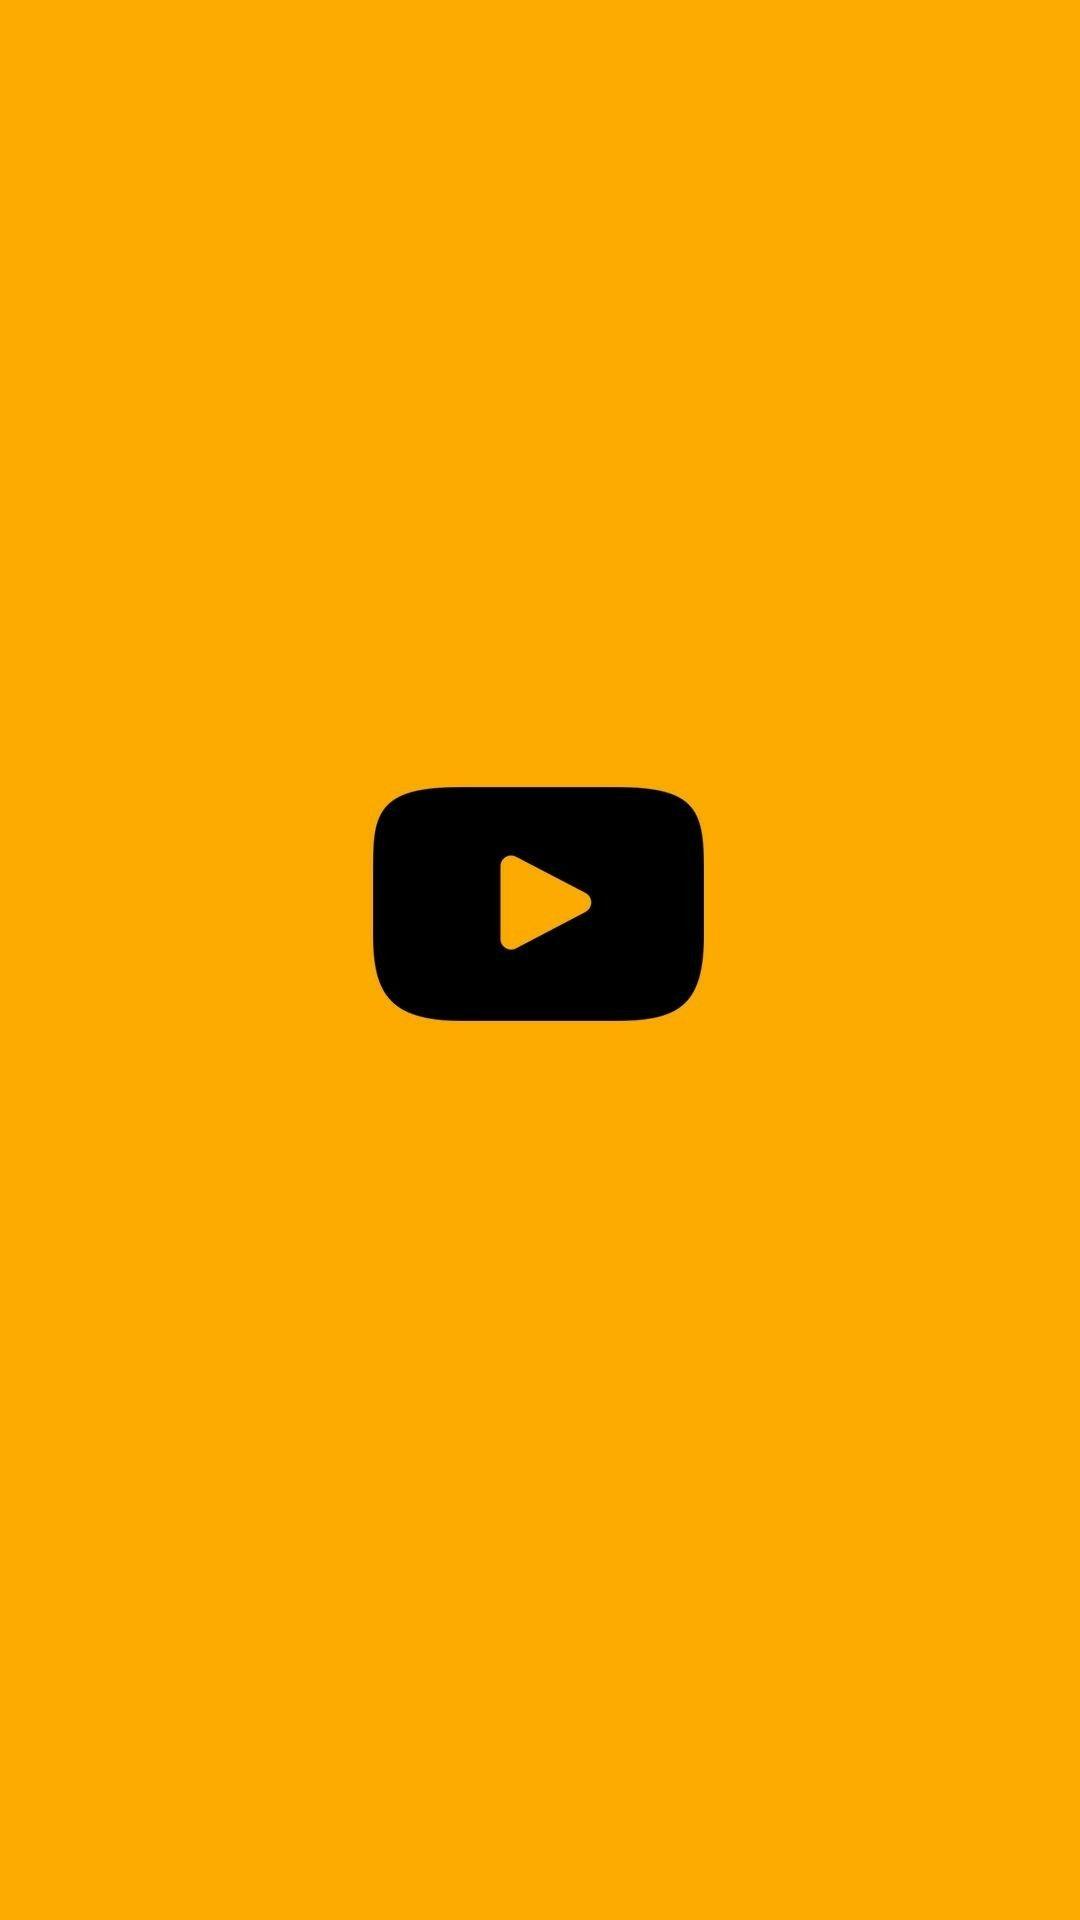 Pin By Alxaomg On Capas De Destaque Do Instagram In 2020 Youtube Logo Instagram Highlight Icons Instagram Logo Transparent